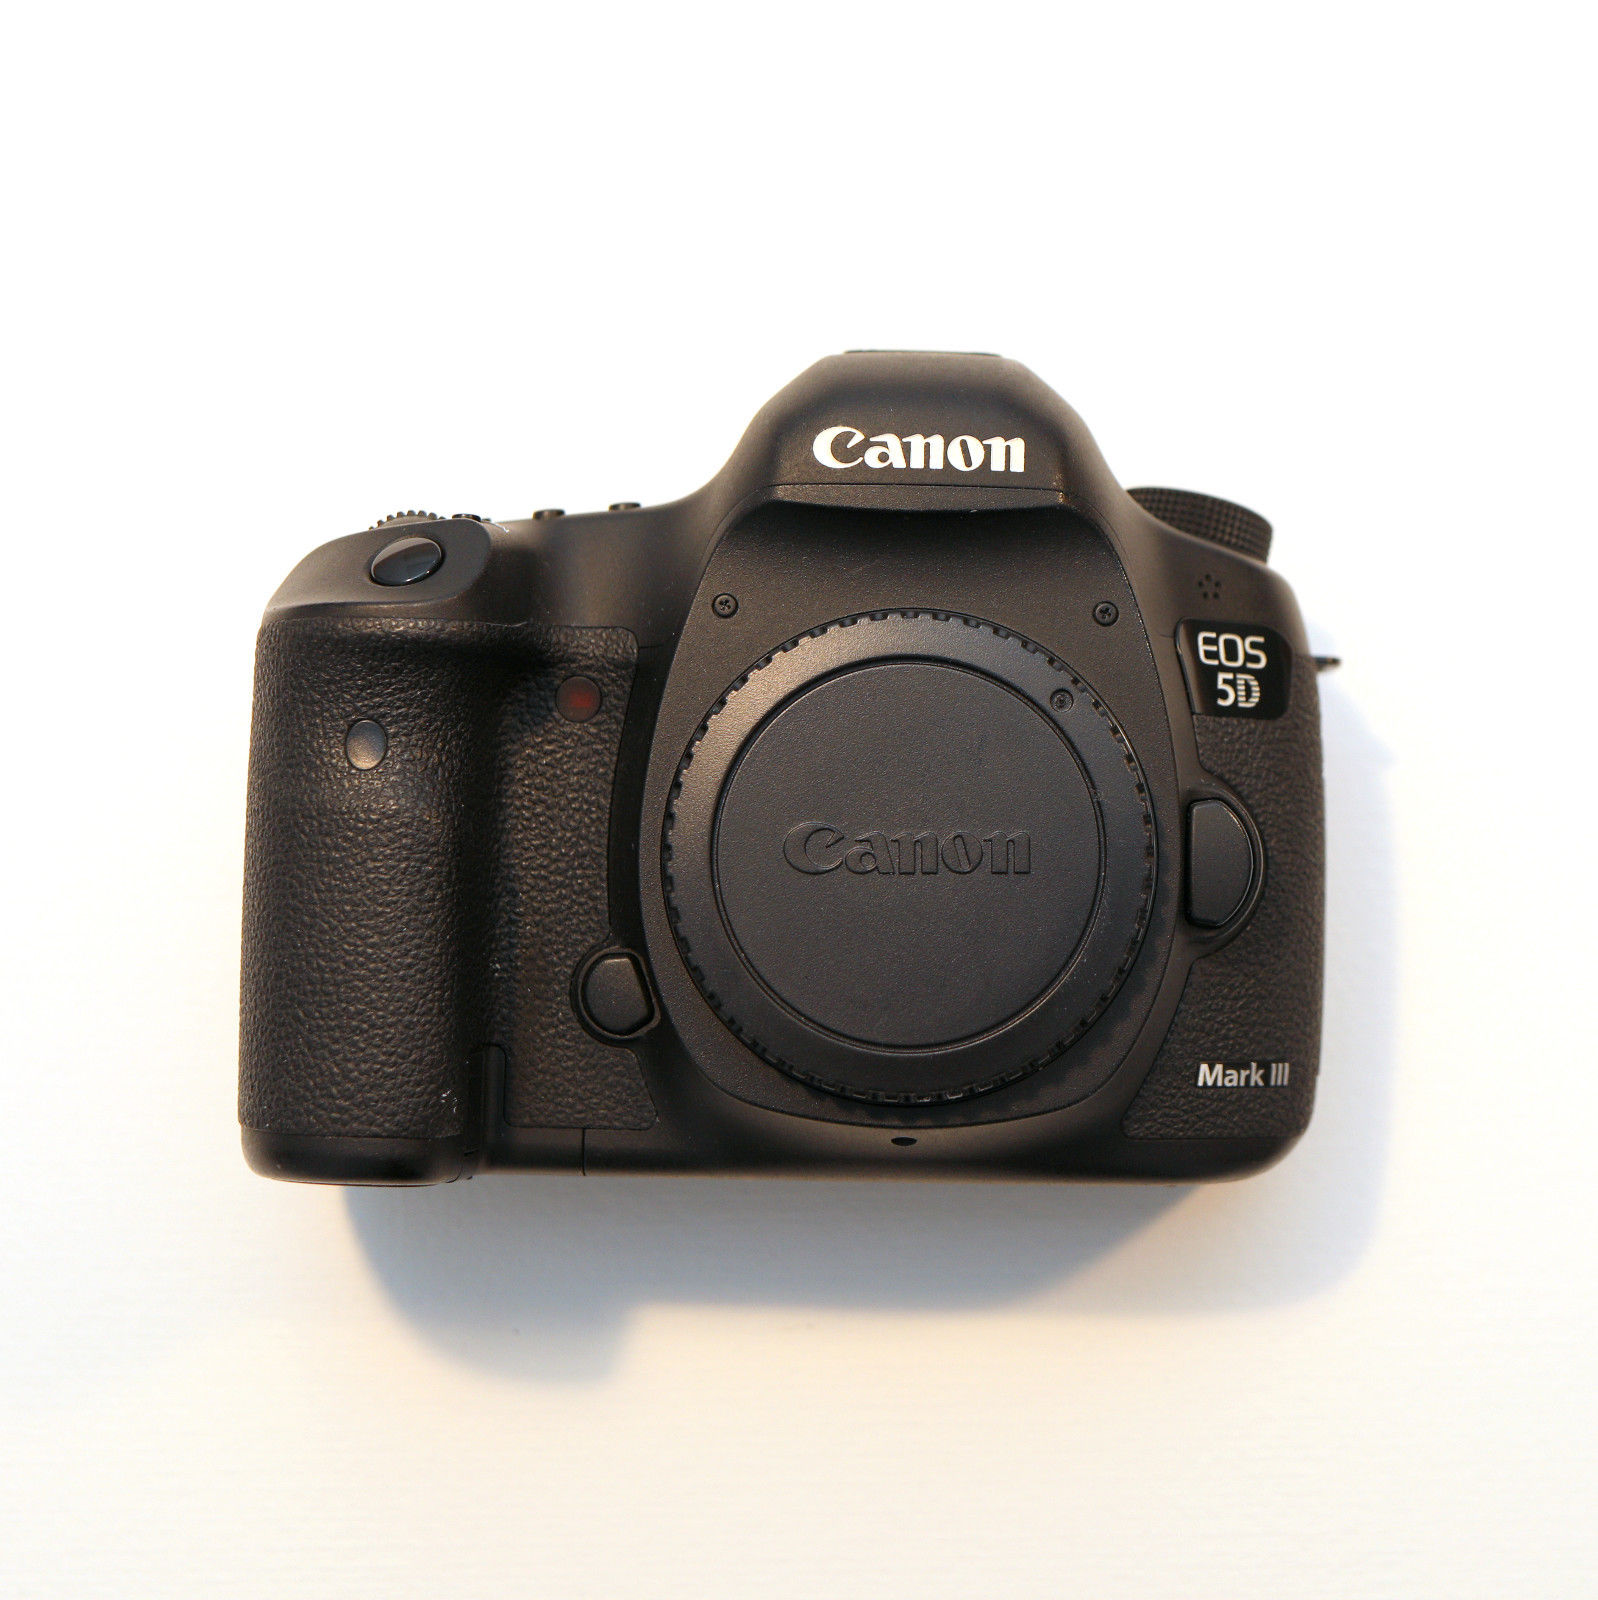 Canon EOS 5D Mark III (22,3 MP) SLR-Digitalkamera Gehäuse Body Schwarz